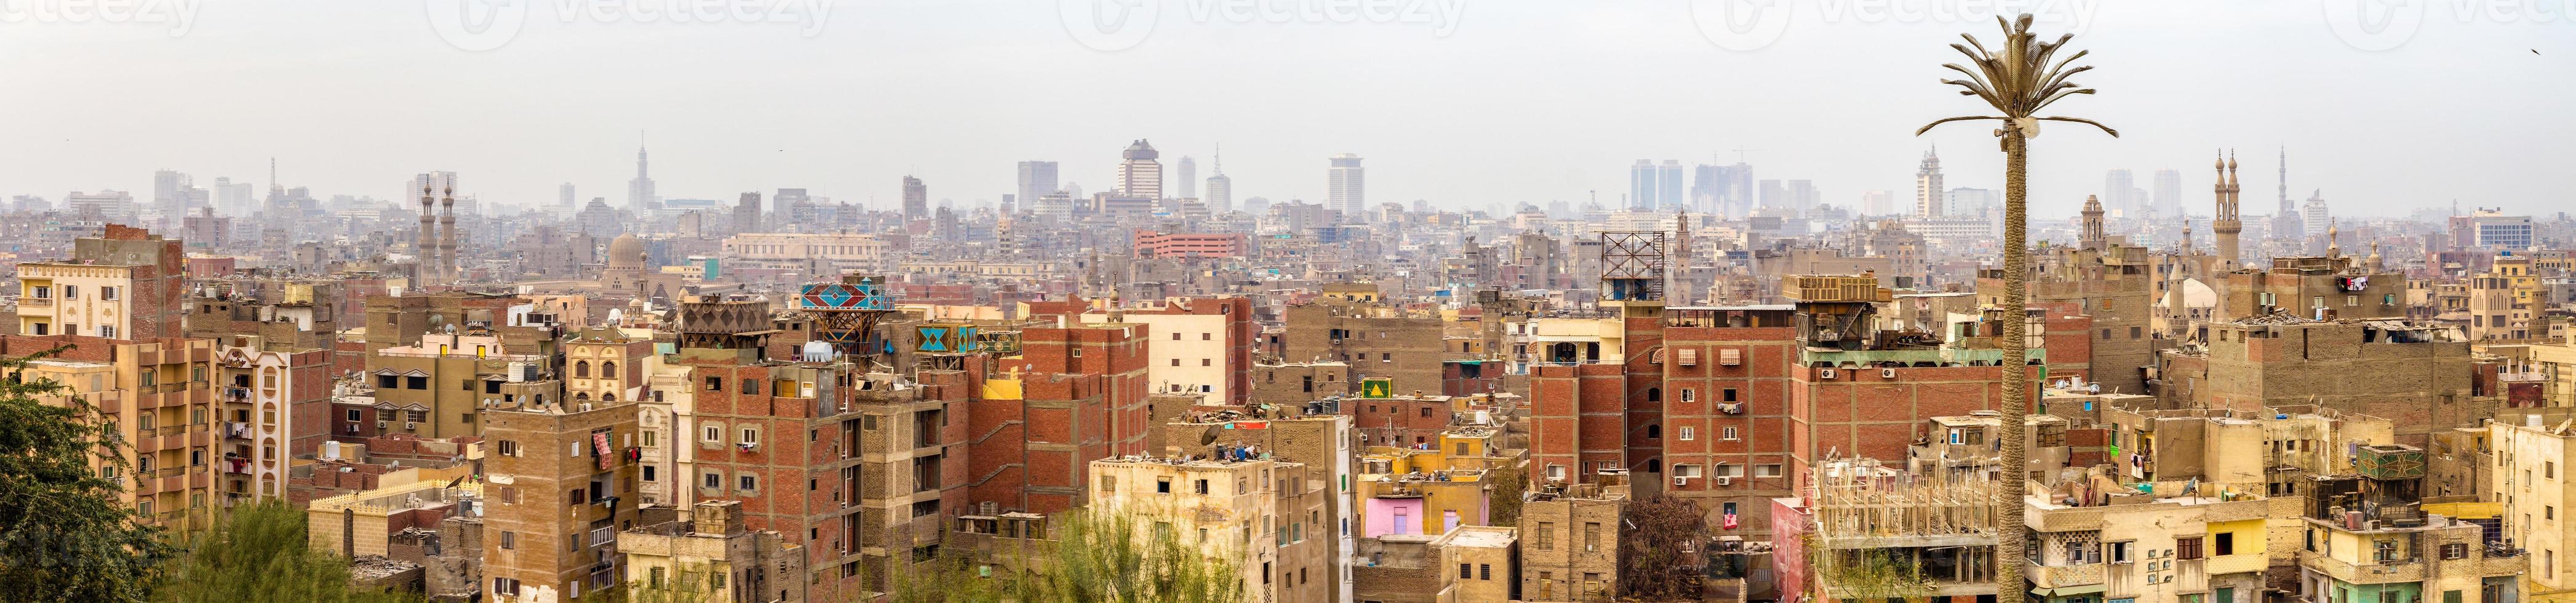 Panorama des islamischen Kairo - Ägypten foto